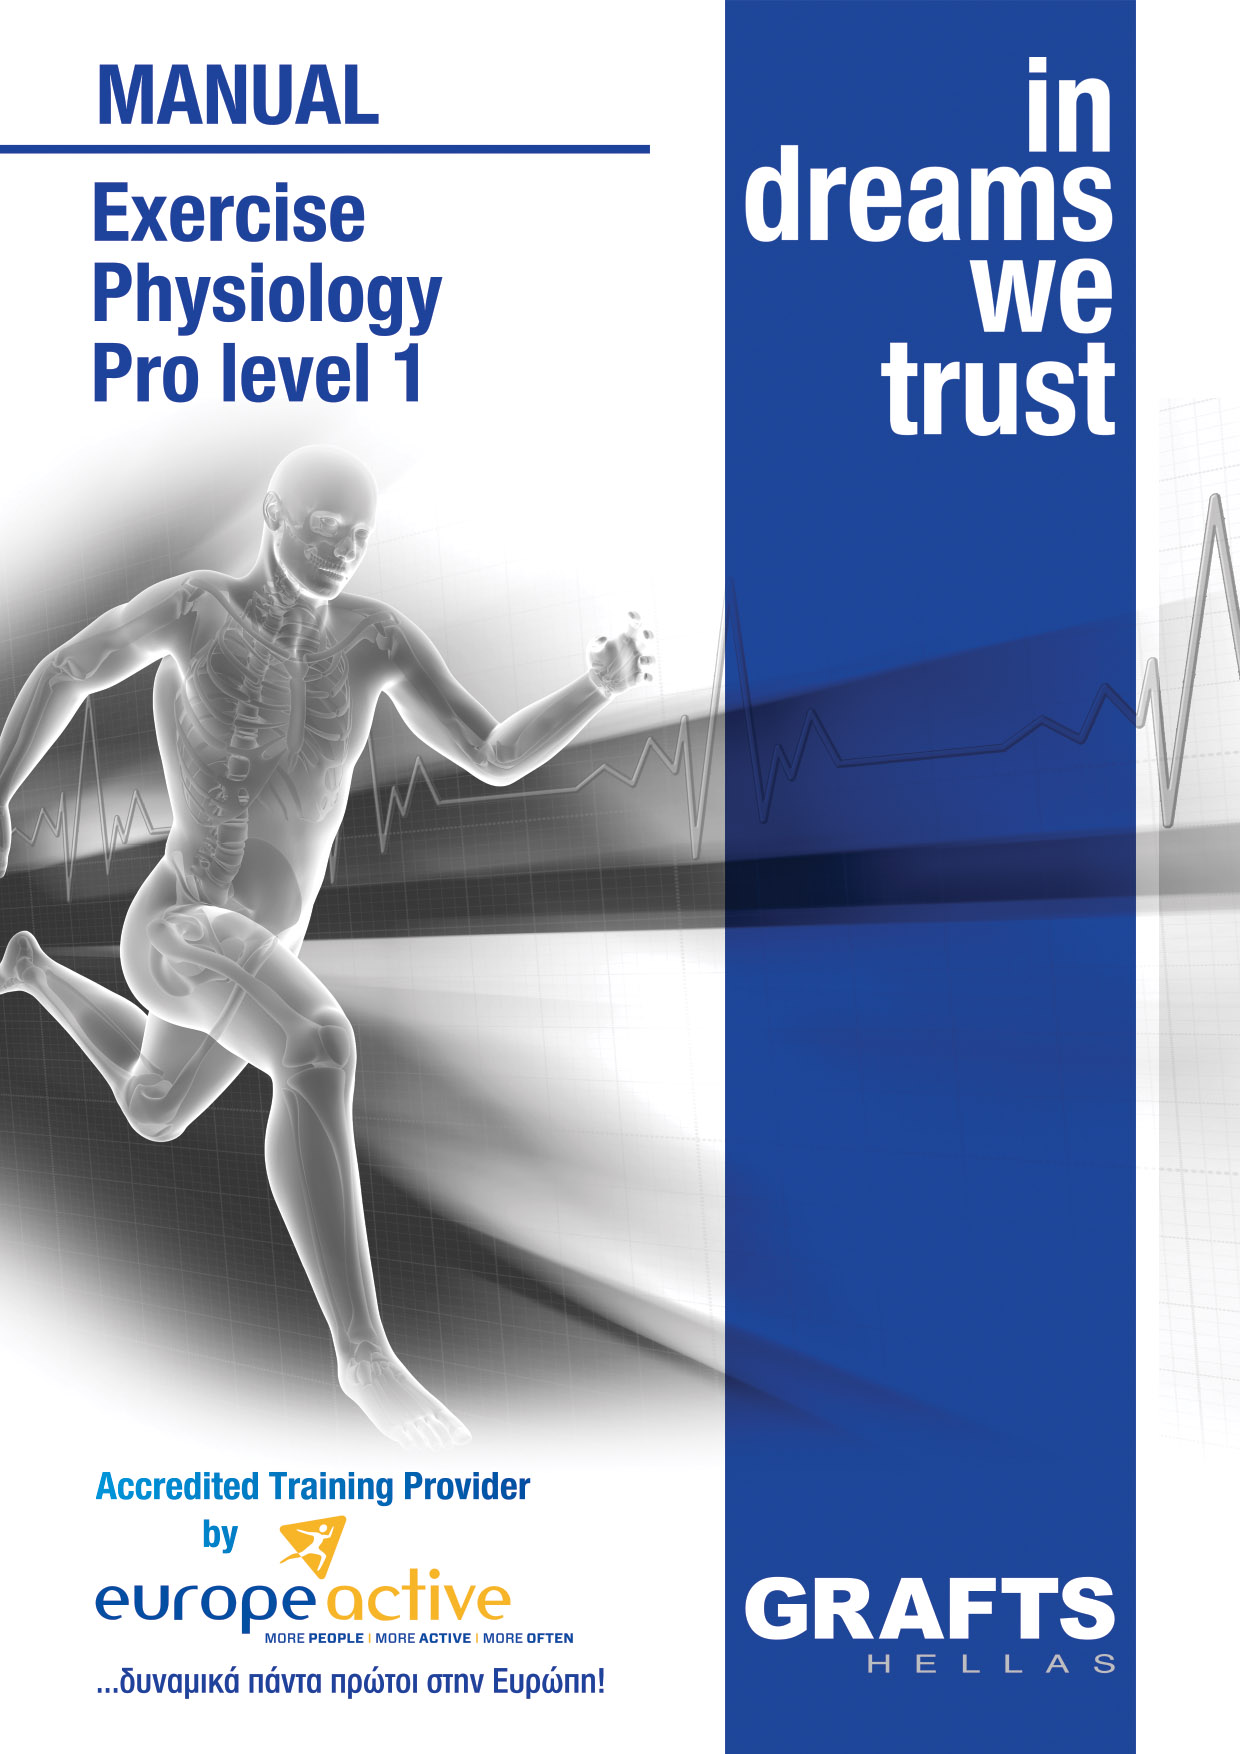 Grafts Hellas manual - Φυσιολογία της Άσκησης - Pro Level 1